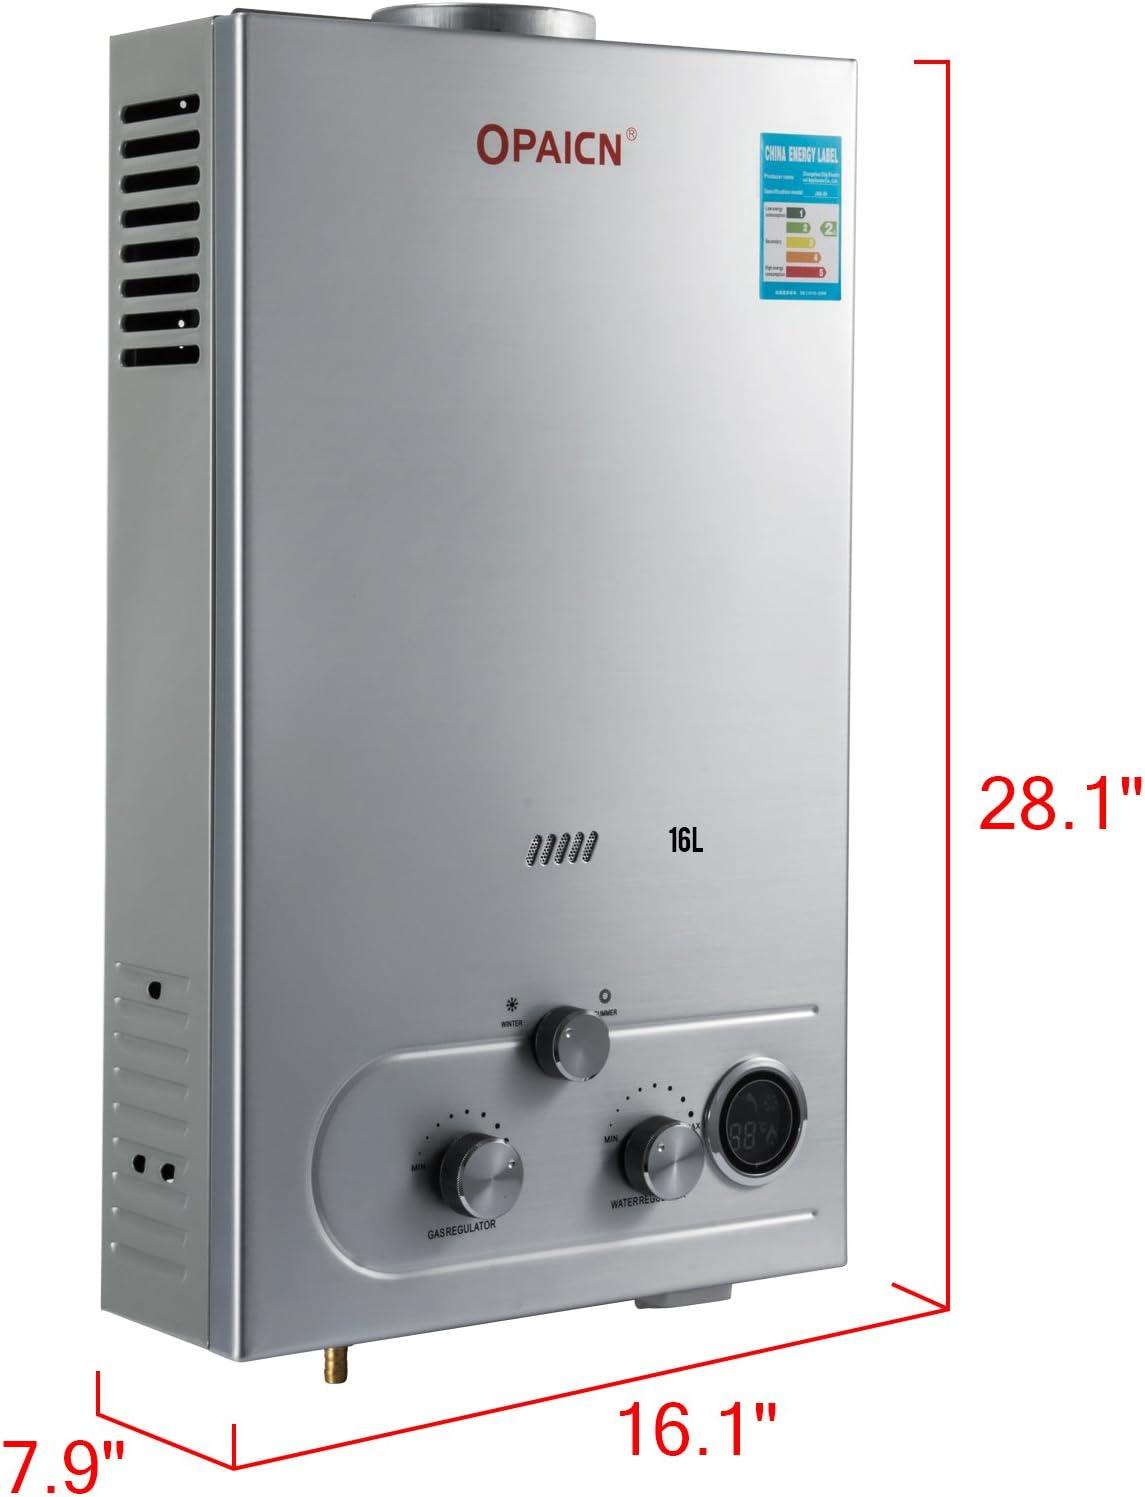 Chaneau Chauffe-eau Sans R/éservoir LPG Chauffe-eau Gaz Butane Chauffe-eau Instantan/é Avec L/écran LCD 16L LPG